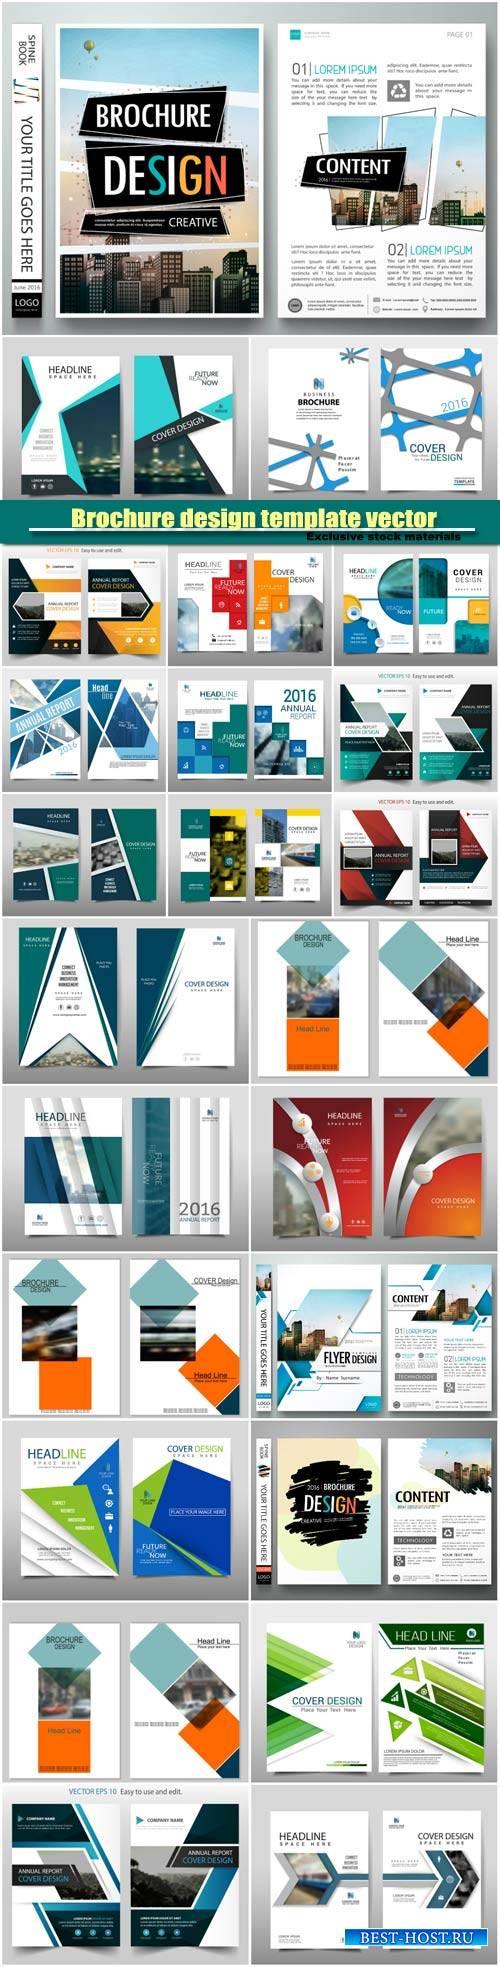 Brochure design template vector layout, cover book portfolio presentation p ...